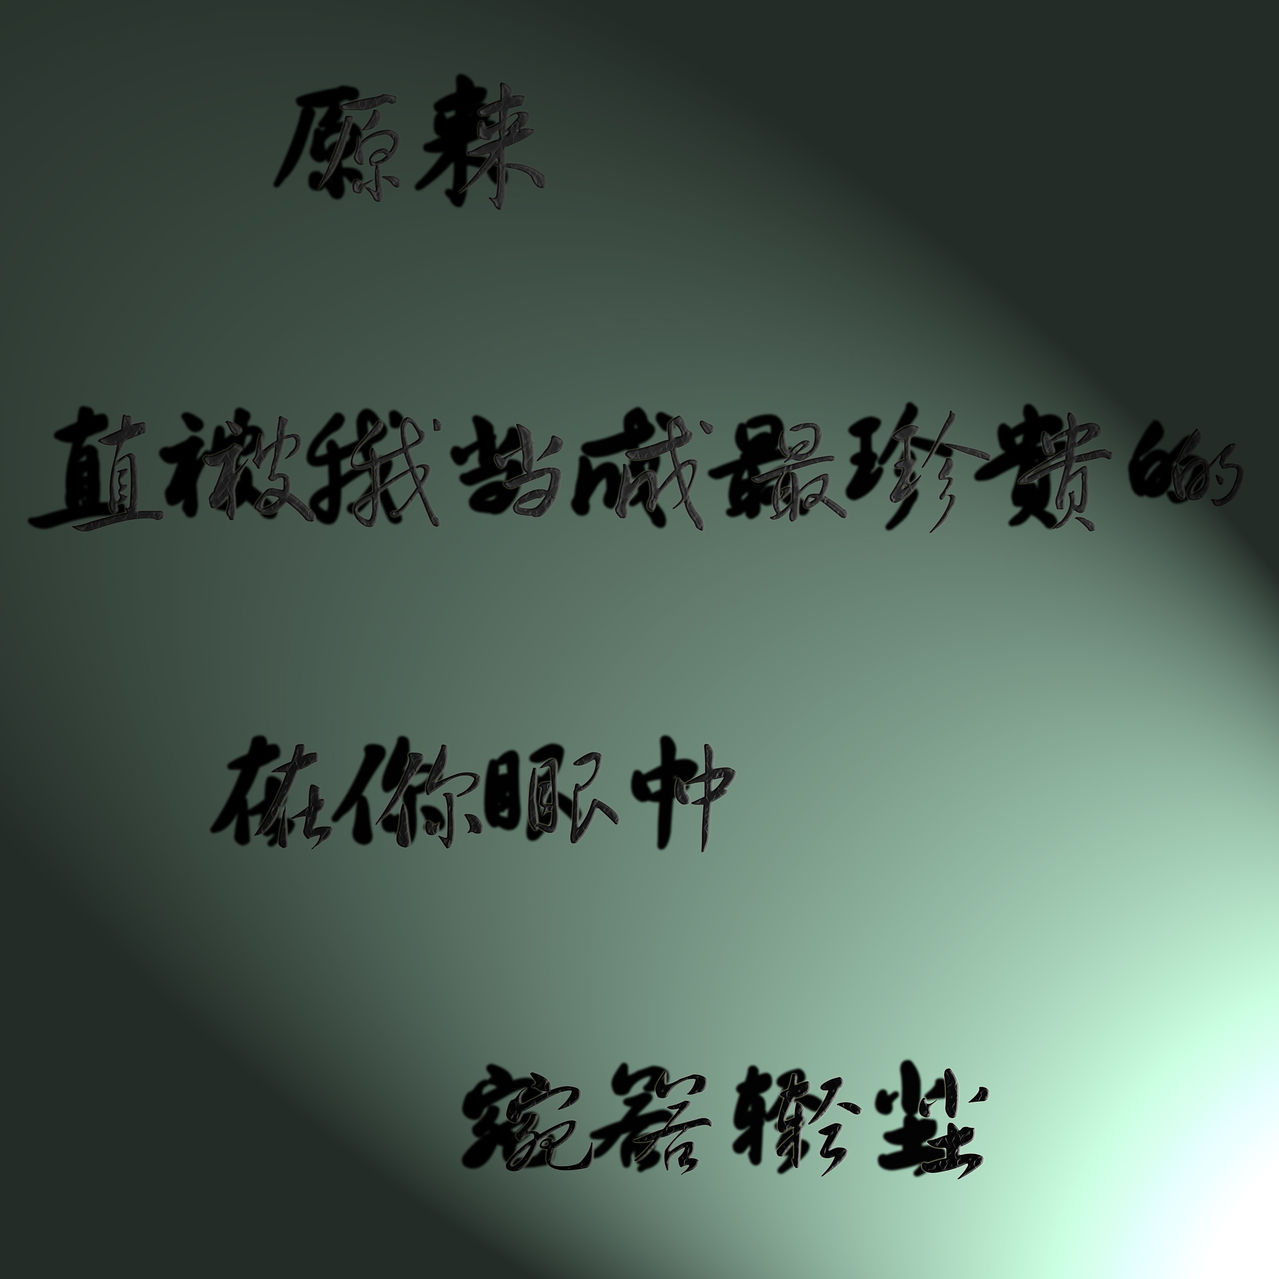 qq网名转换拼音_好看符号大全非主流图片_好看符号大全非主流图片下载